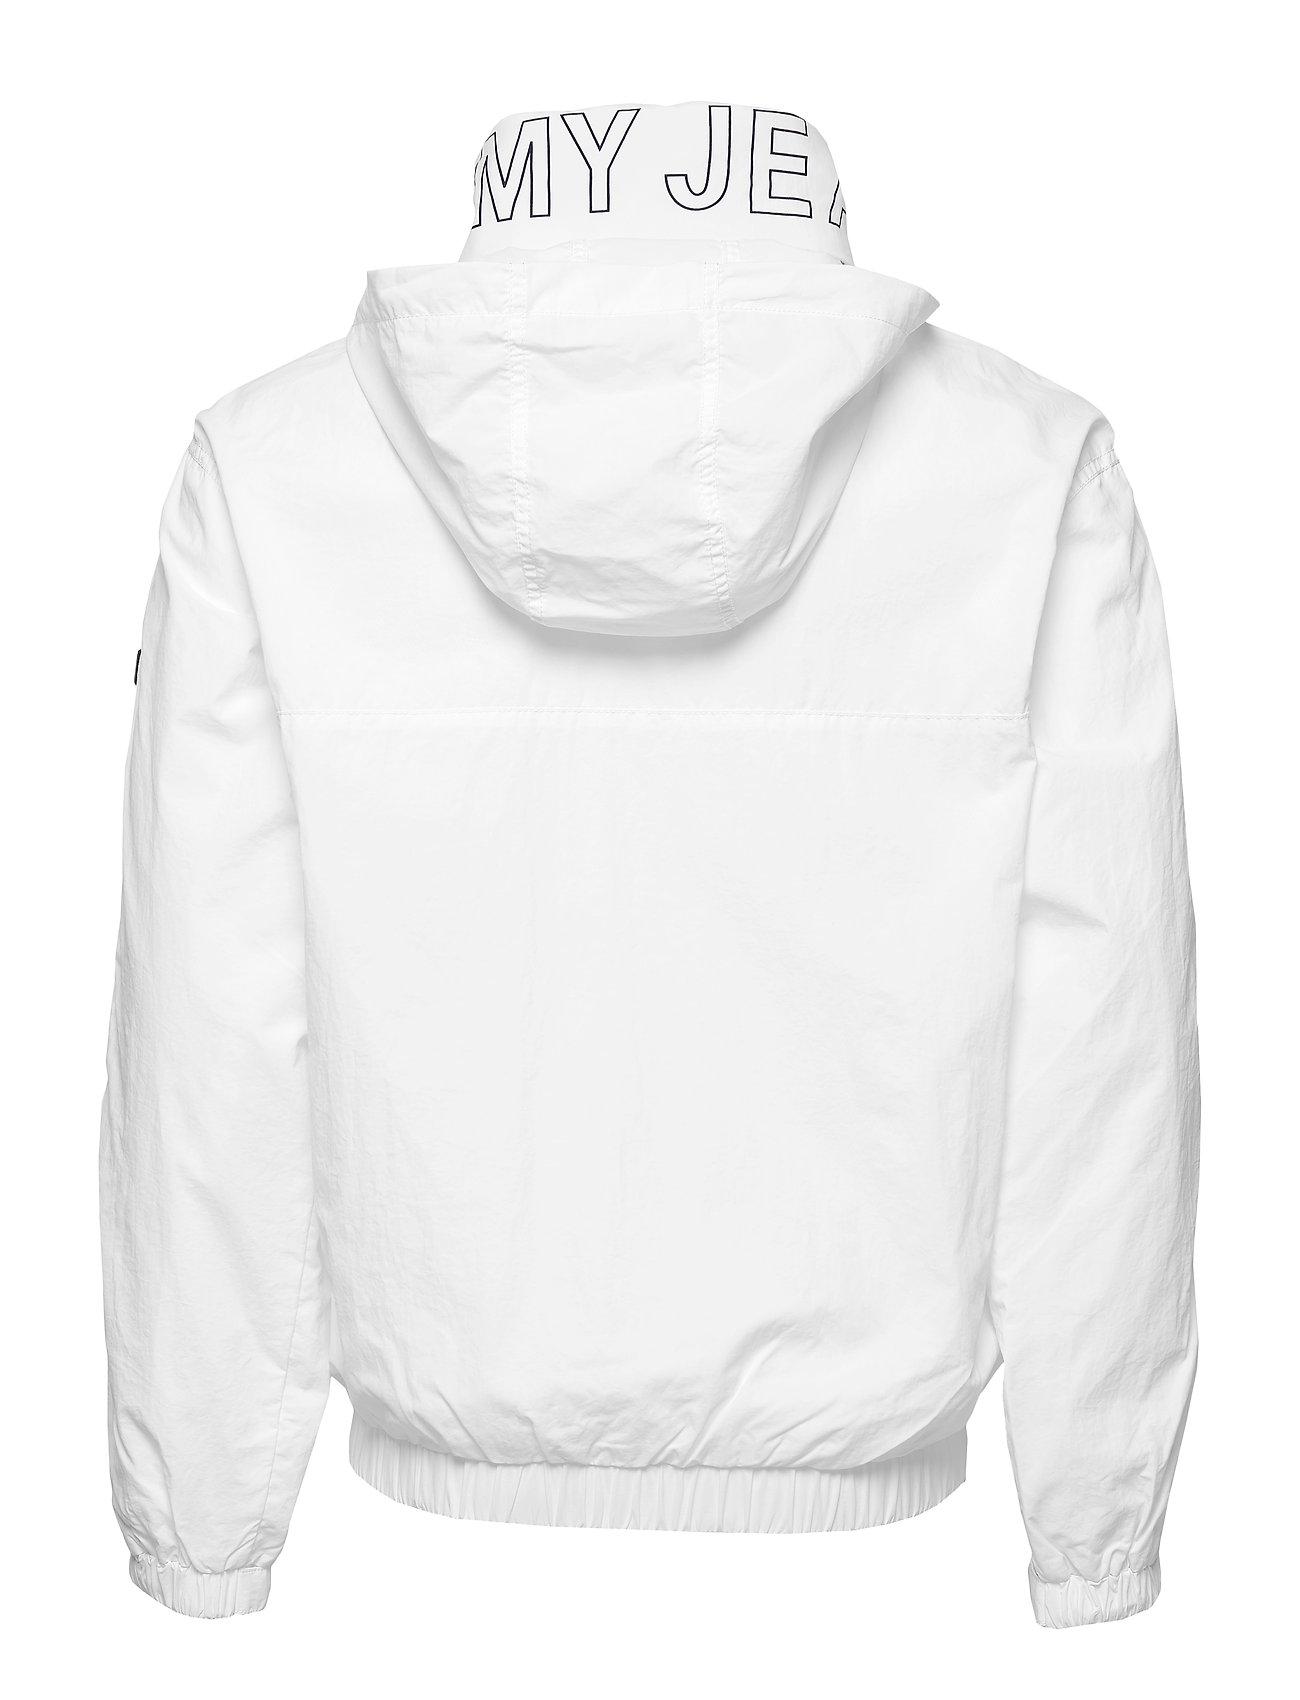 Tjm WhiteTommy Popover Jacketclassic Jeans WhiteTommy Popover Jacketclassic Tjm Jeans vmNn0O8w